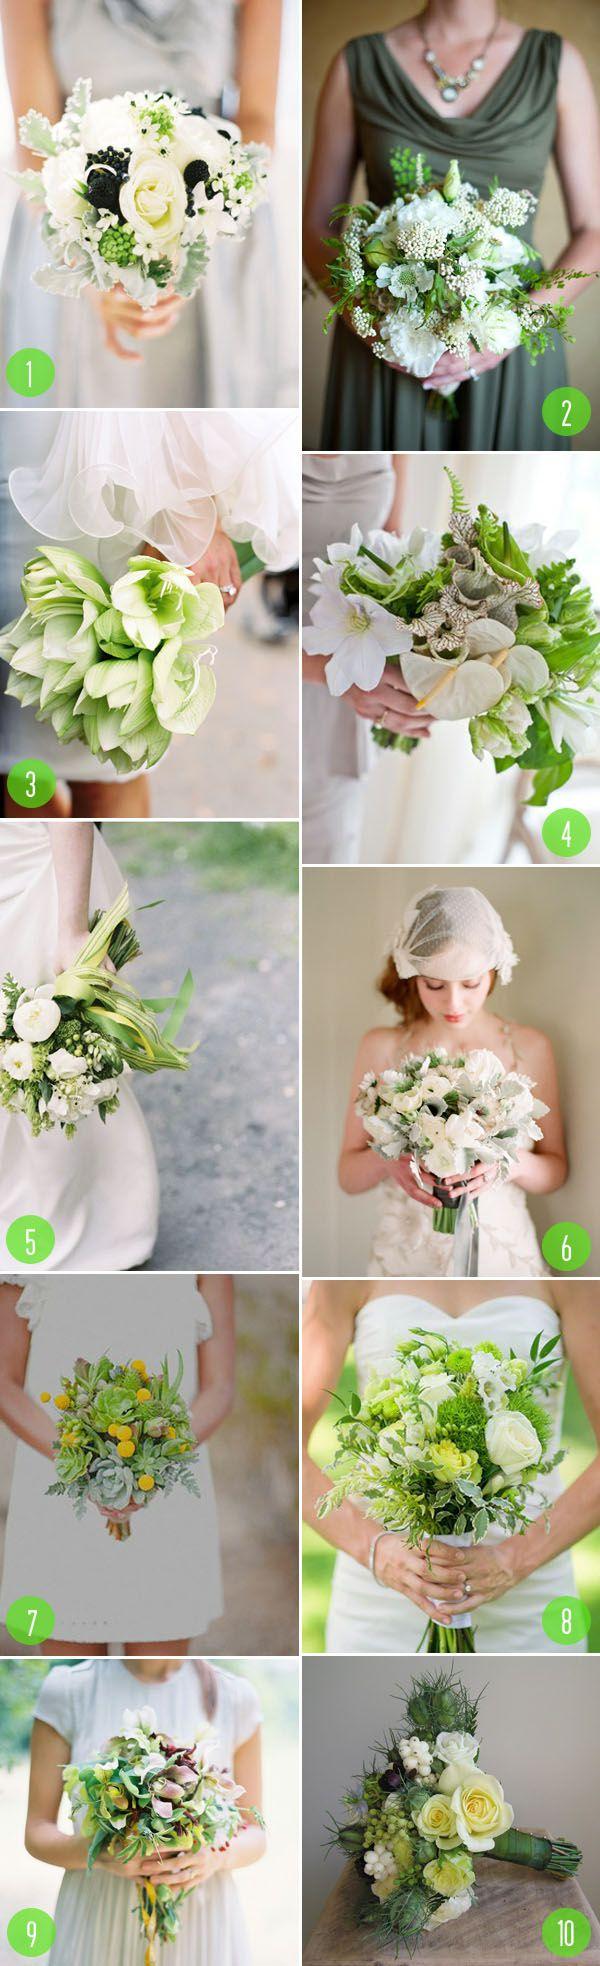 Share Tweet + 1 Mail 1.The Green Vase via Jen Huang | 2.via Michael Radford Photography | 3.Karen Wise's flickr | 4.Flowerwild via Amy ...